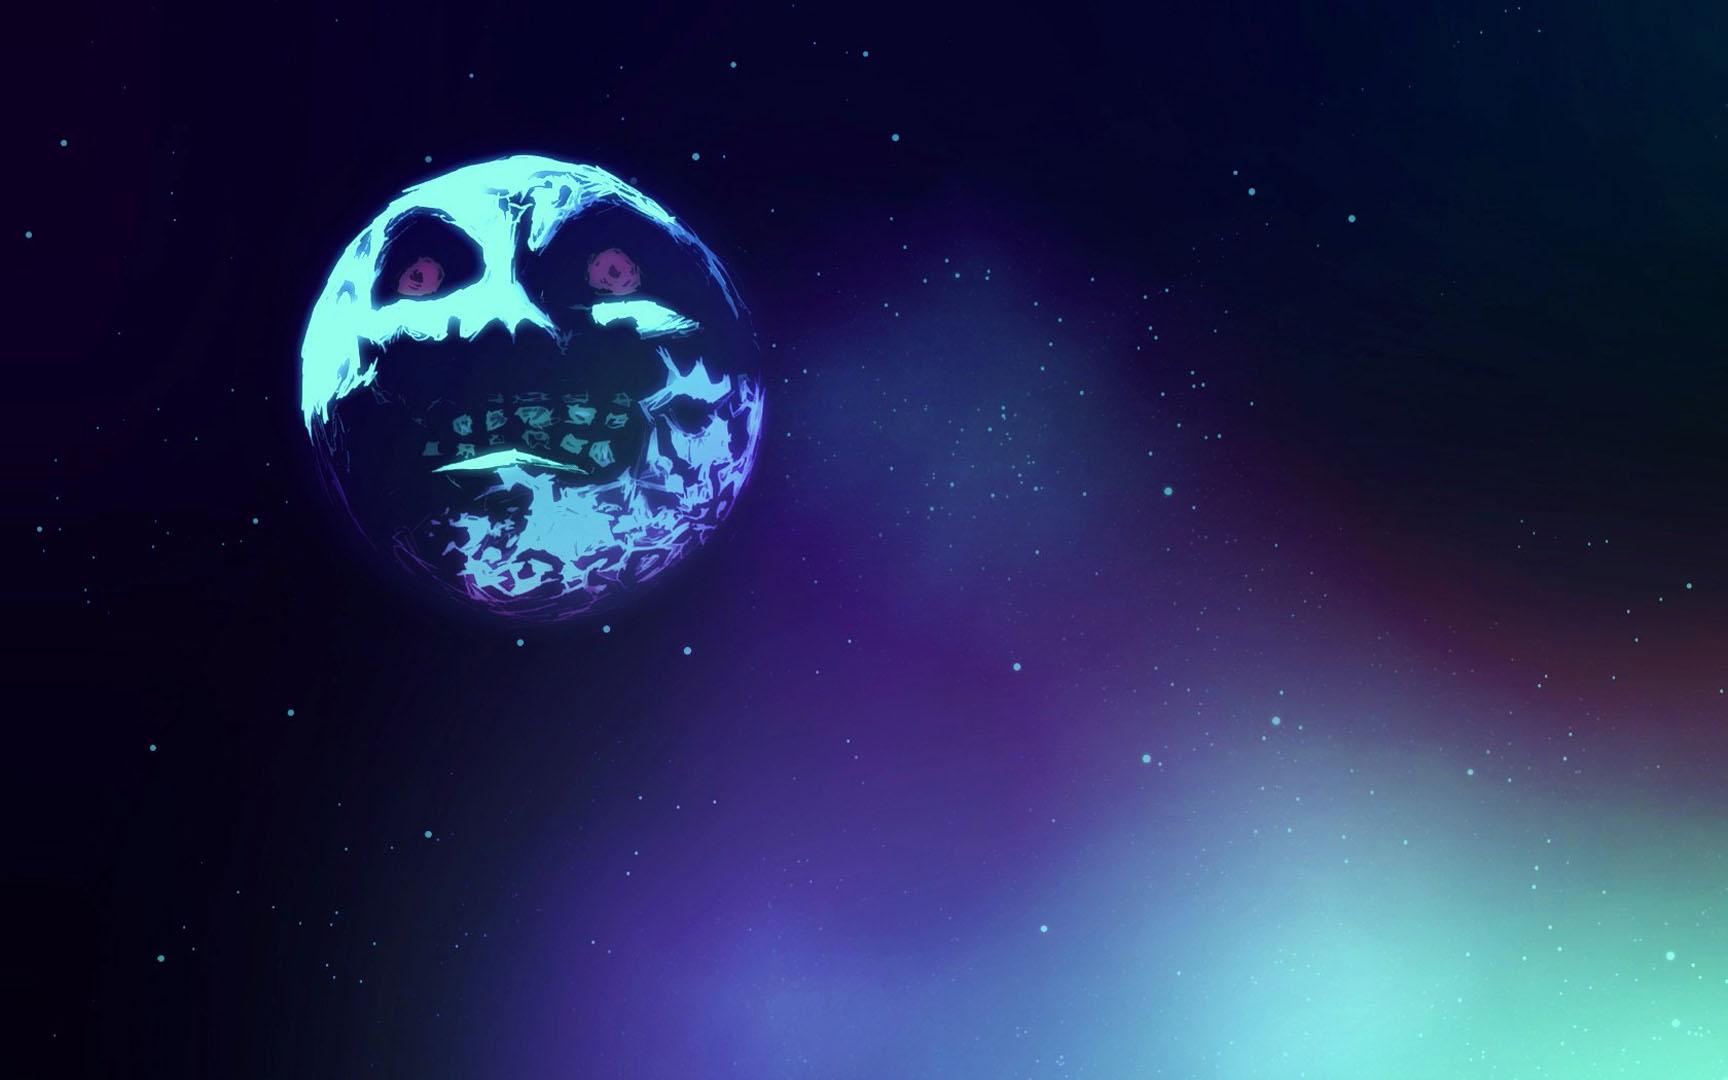 Majoras Mask Moon Majora S Mask Moon Background 283253 Hd Wallpaper Backgrounds Download